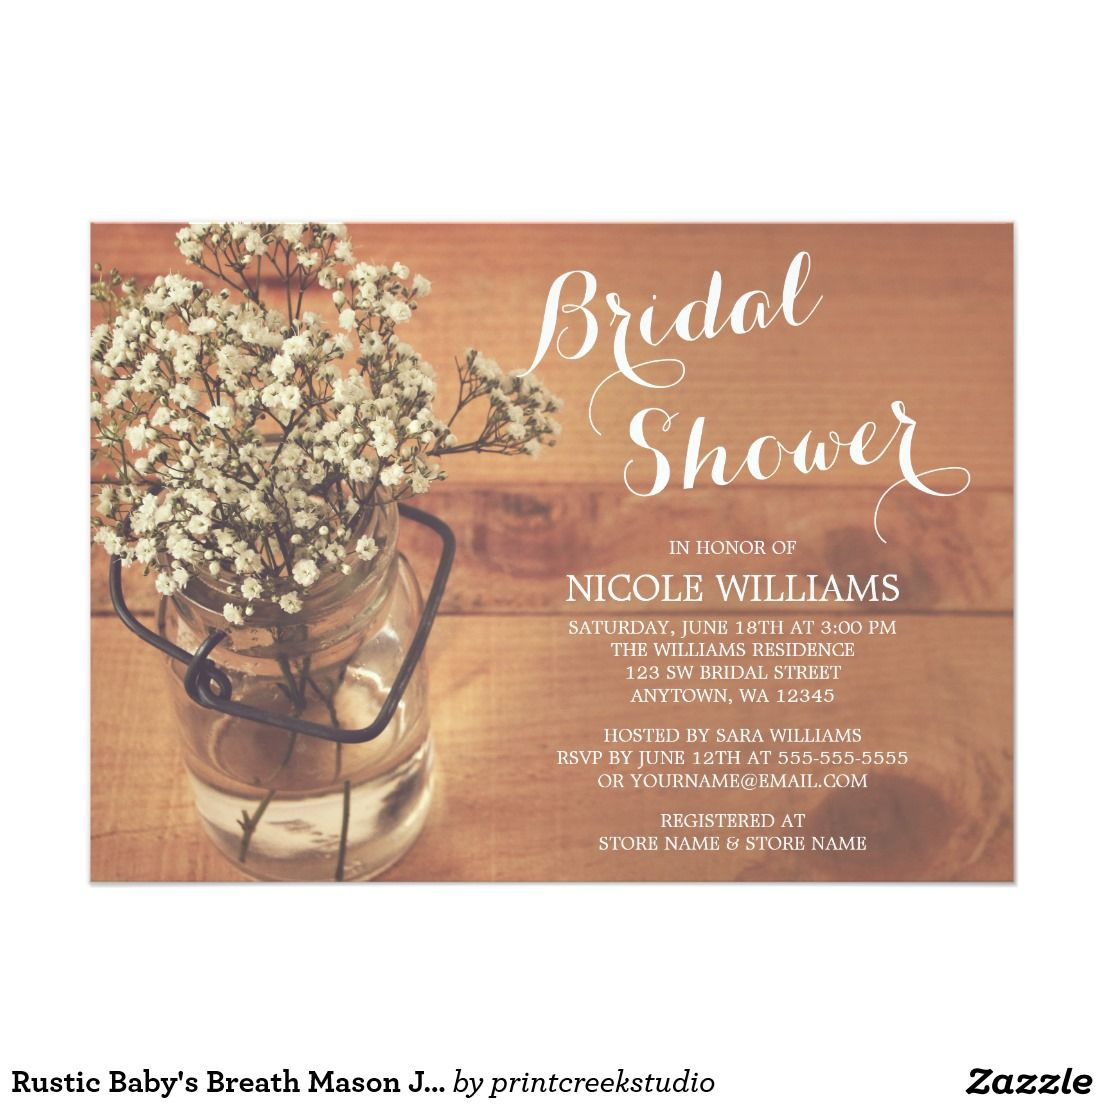 rustic baby's breath mason jar wood bridal shower card | bridal, Baby shower invitations